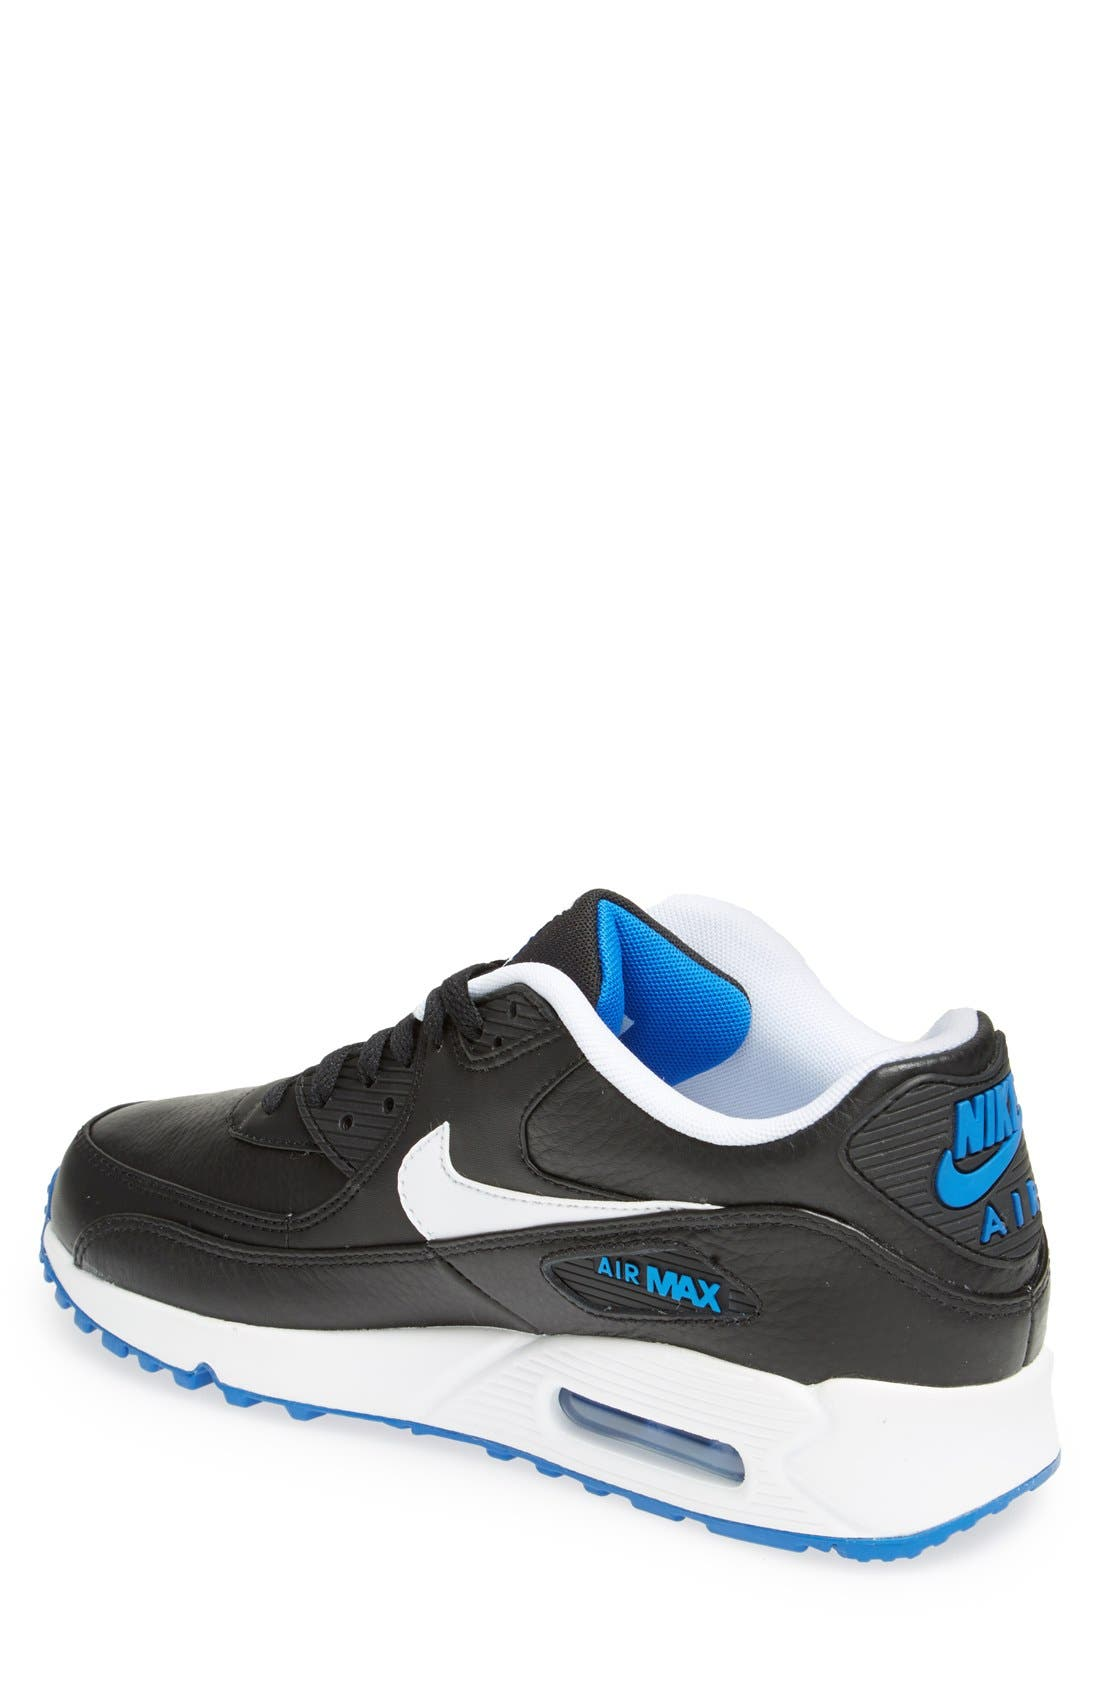 NIKE,                             'Air Max 90 LTR' Sneaker,                             Alternate thumbnail 3, color,                             001